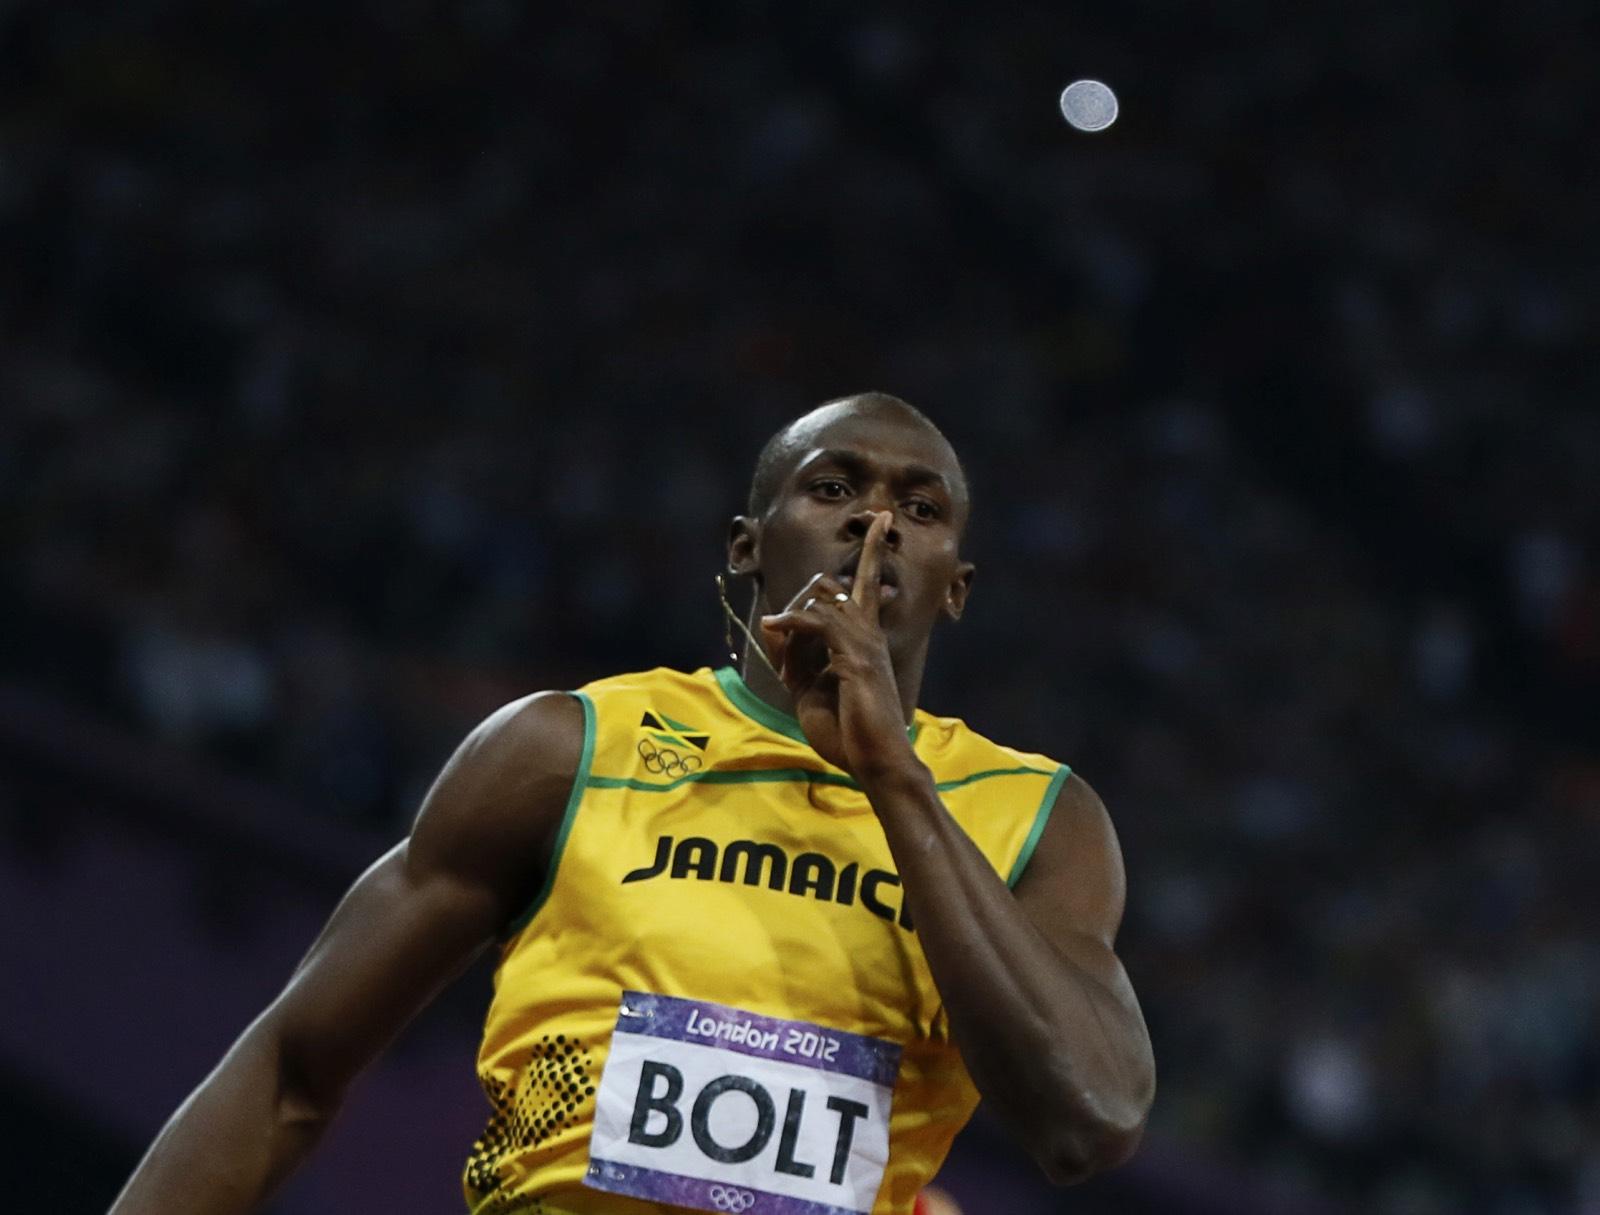 Usain Bolt Beaten By American Justin Gatlin At IAAF Championships